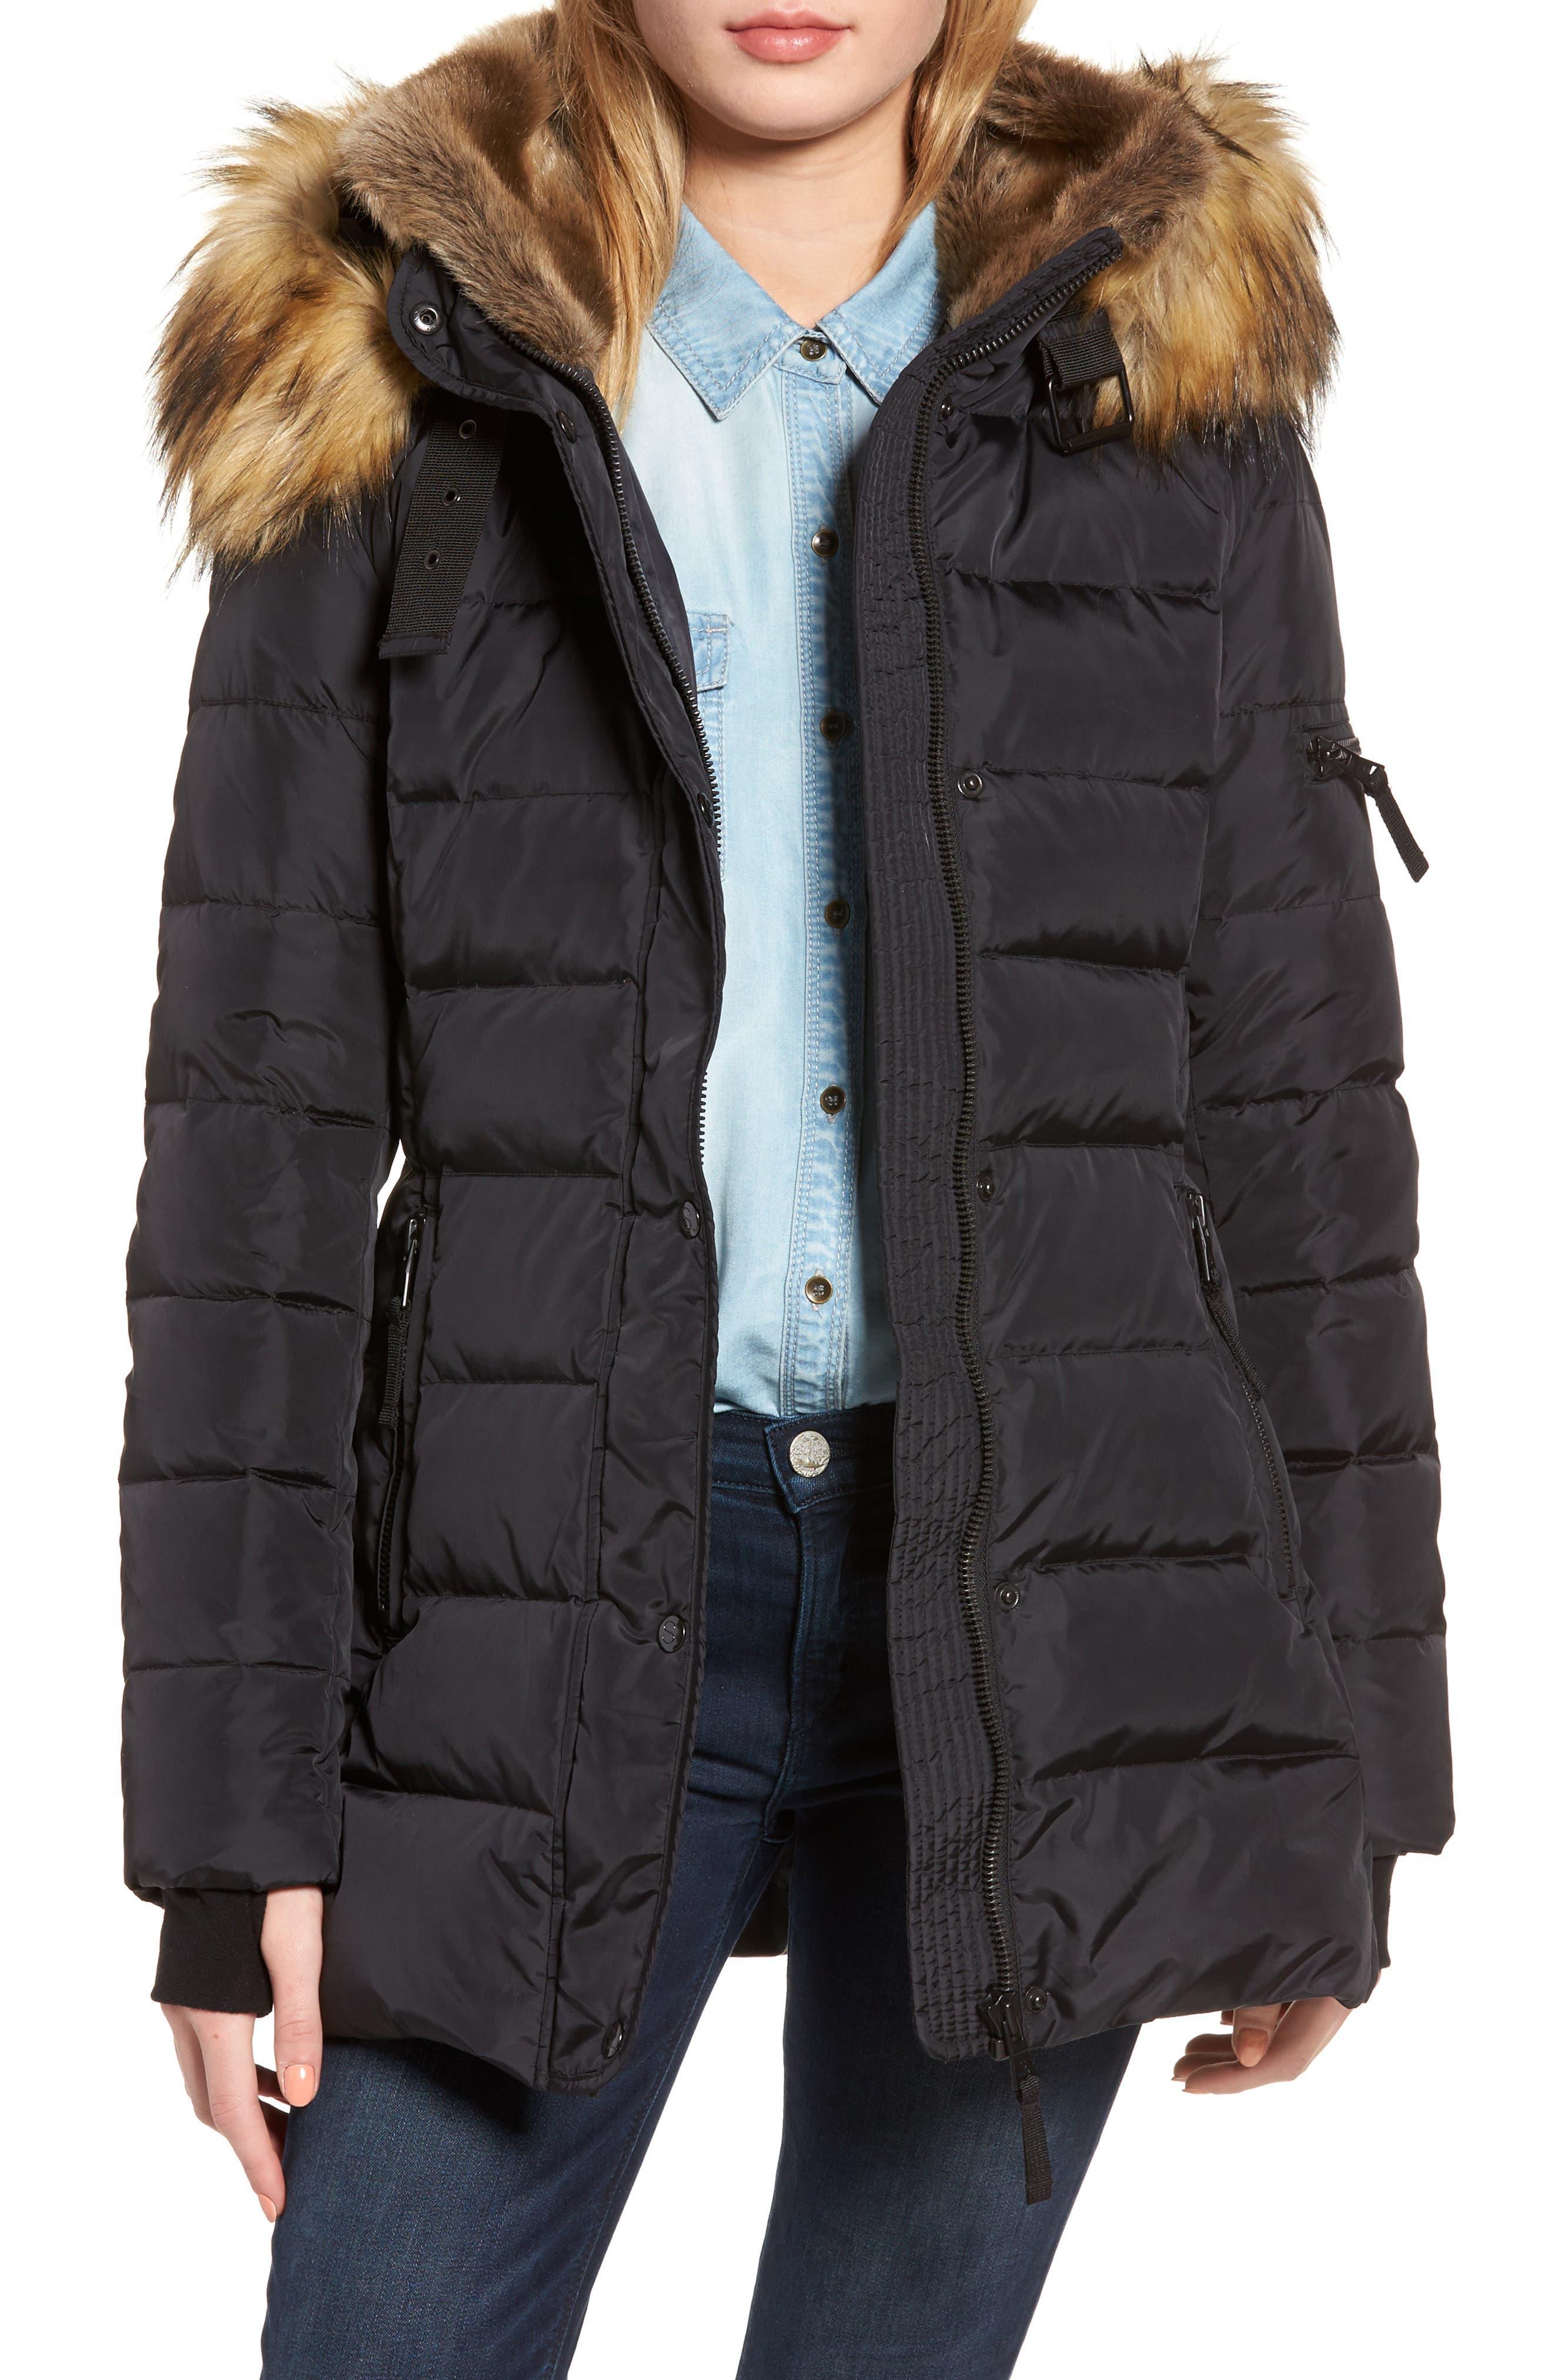 Alternate Image 1 Selected - S13 Faux Fur Hooded Coat